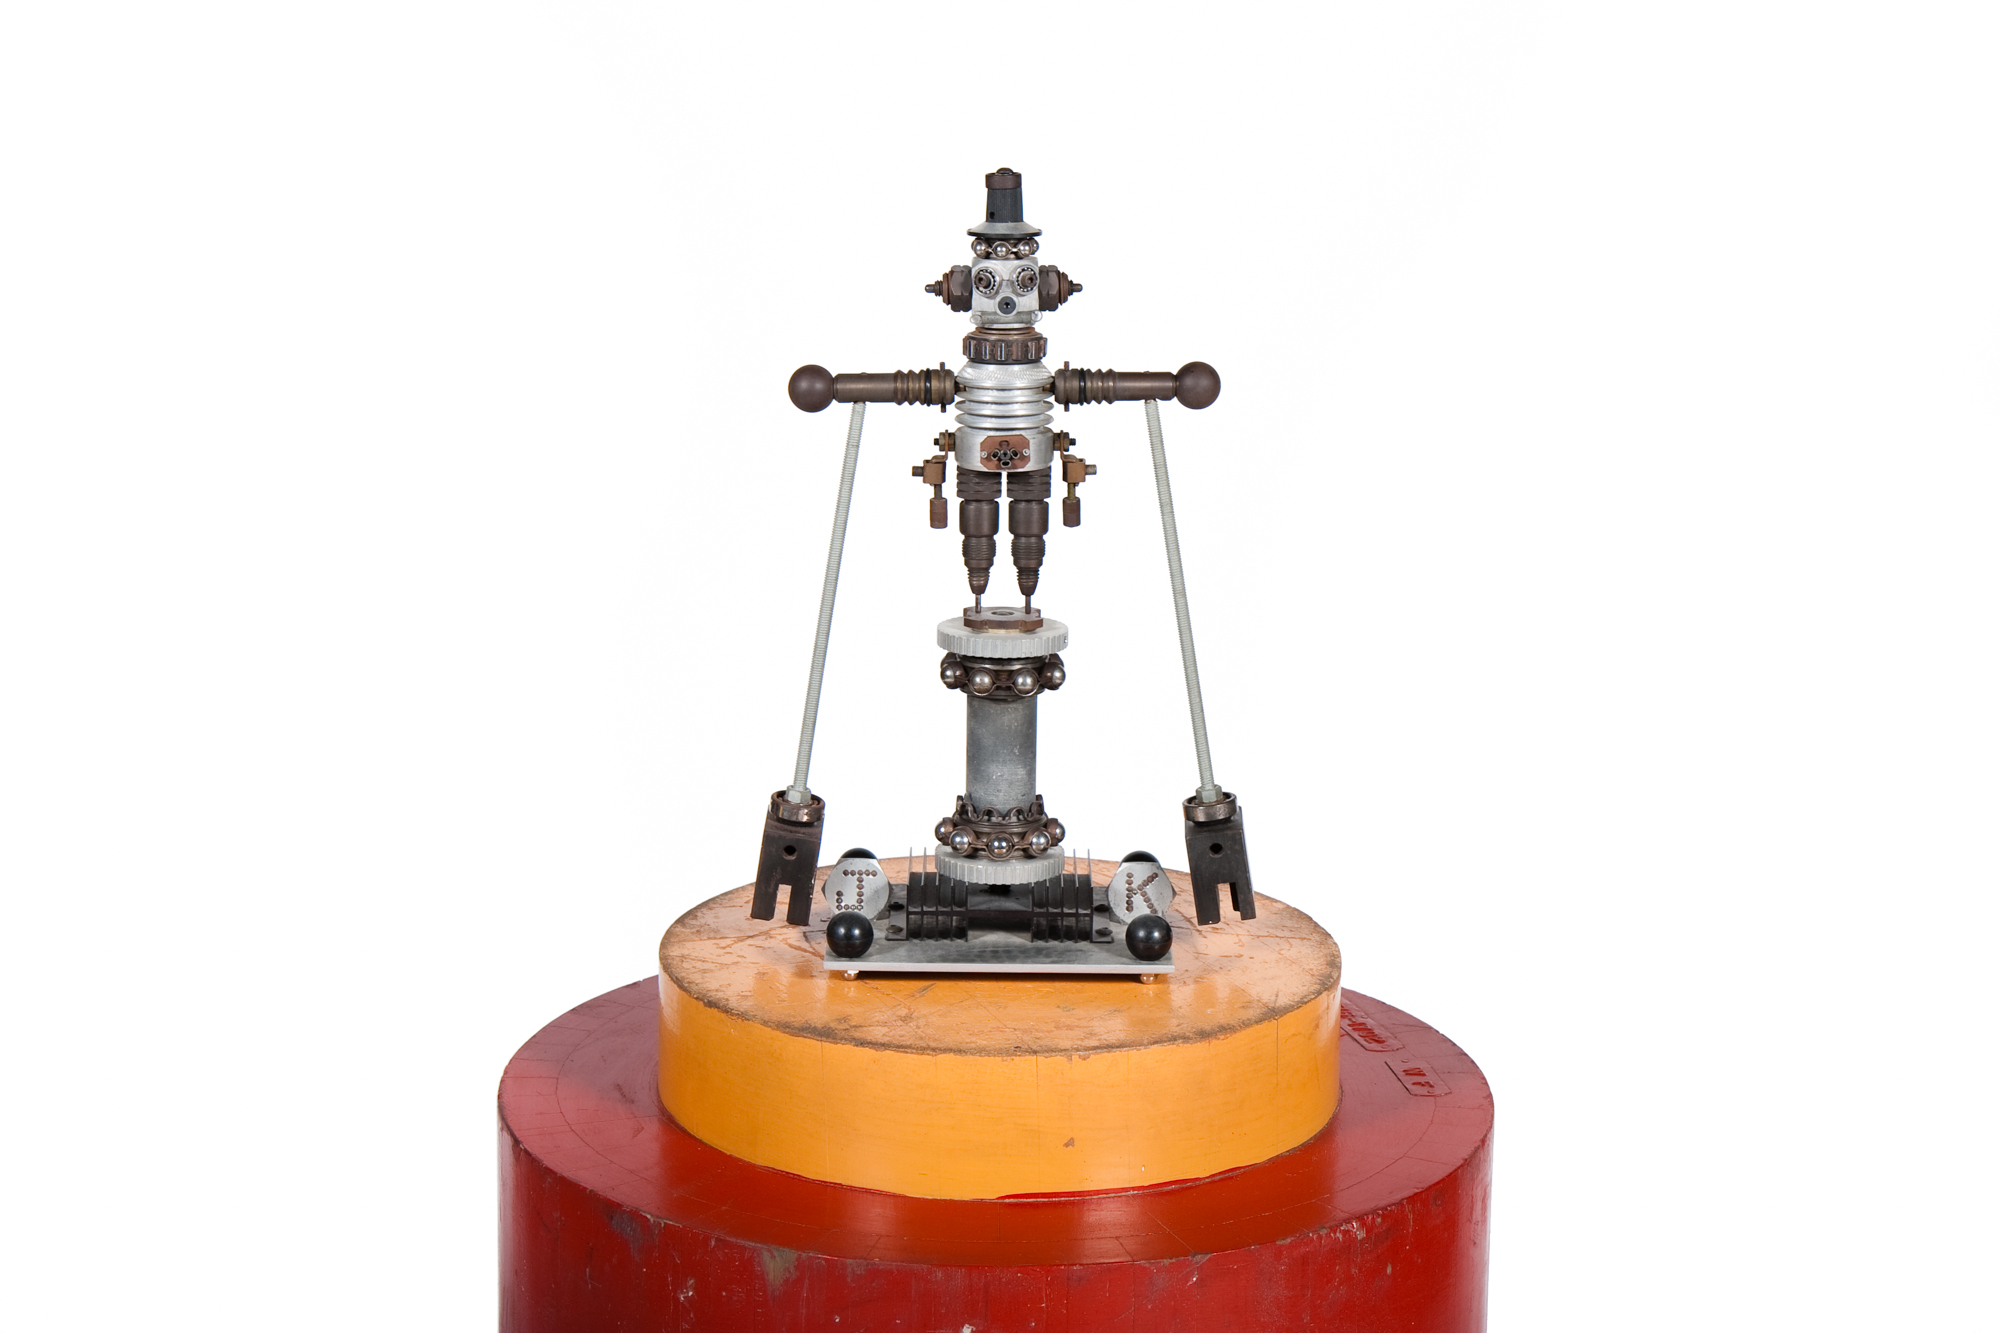 Folk Art – Machine Shop Pen Holder Featuring a Balancing Robot with Rayguns (circa 1960)